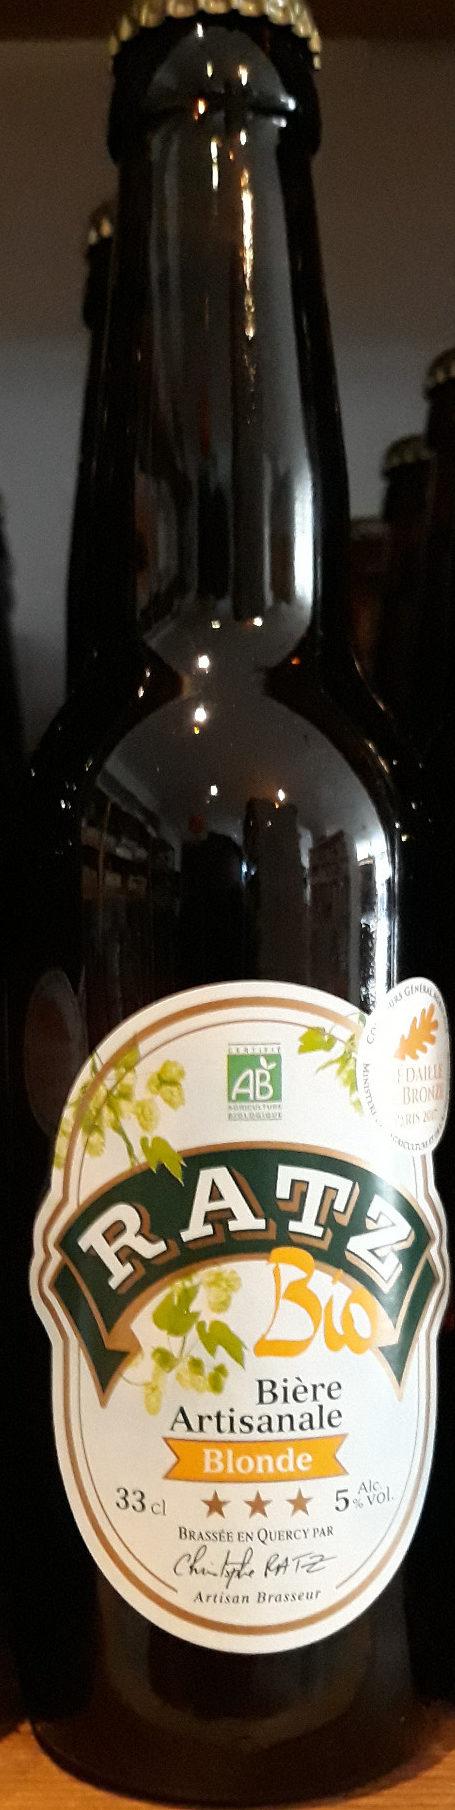 Biere Blonde 33CL Artisanale Bio - Product - fr